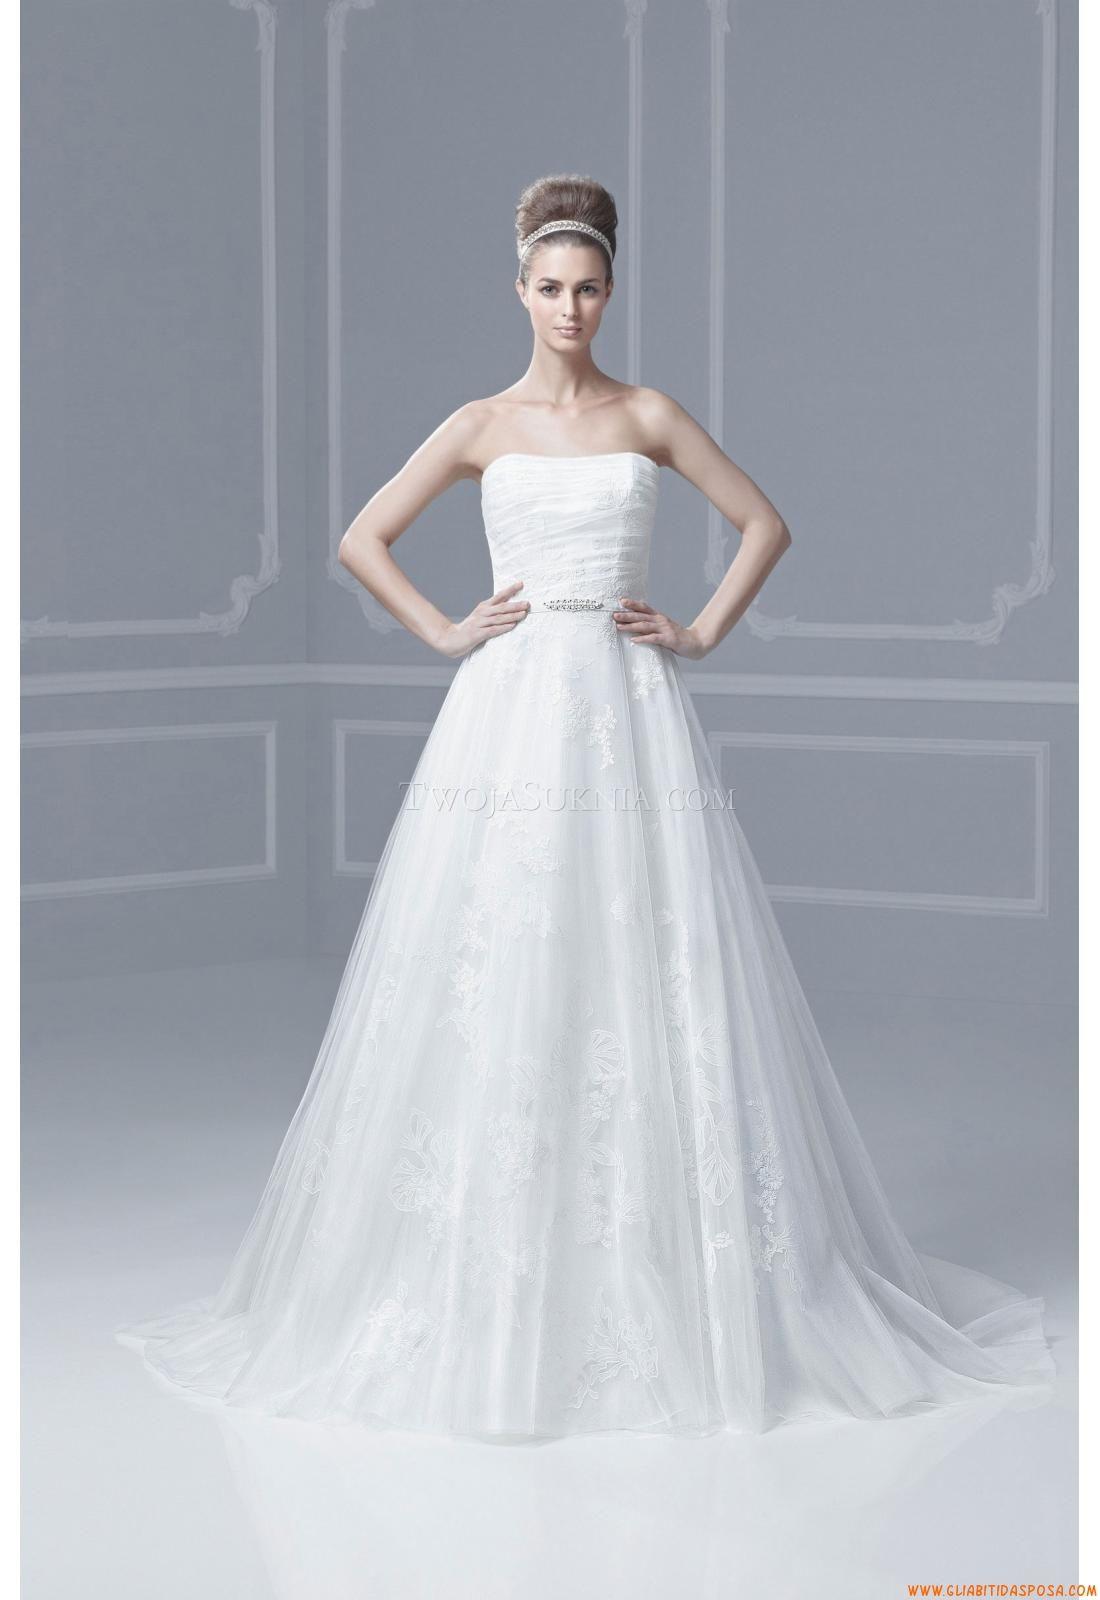 Wedding dresses fresno  Abiti da Sposa Enzoani Foyers Blue By Enzoani   Abiti da sposa